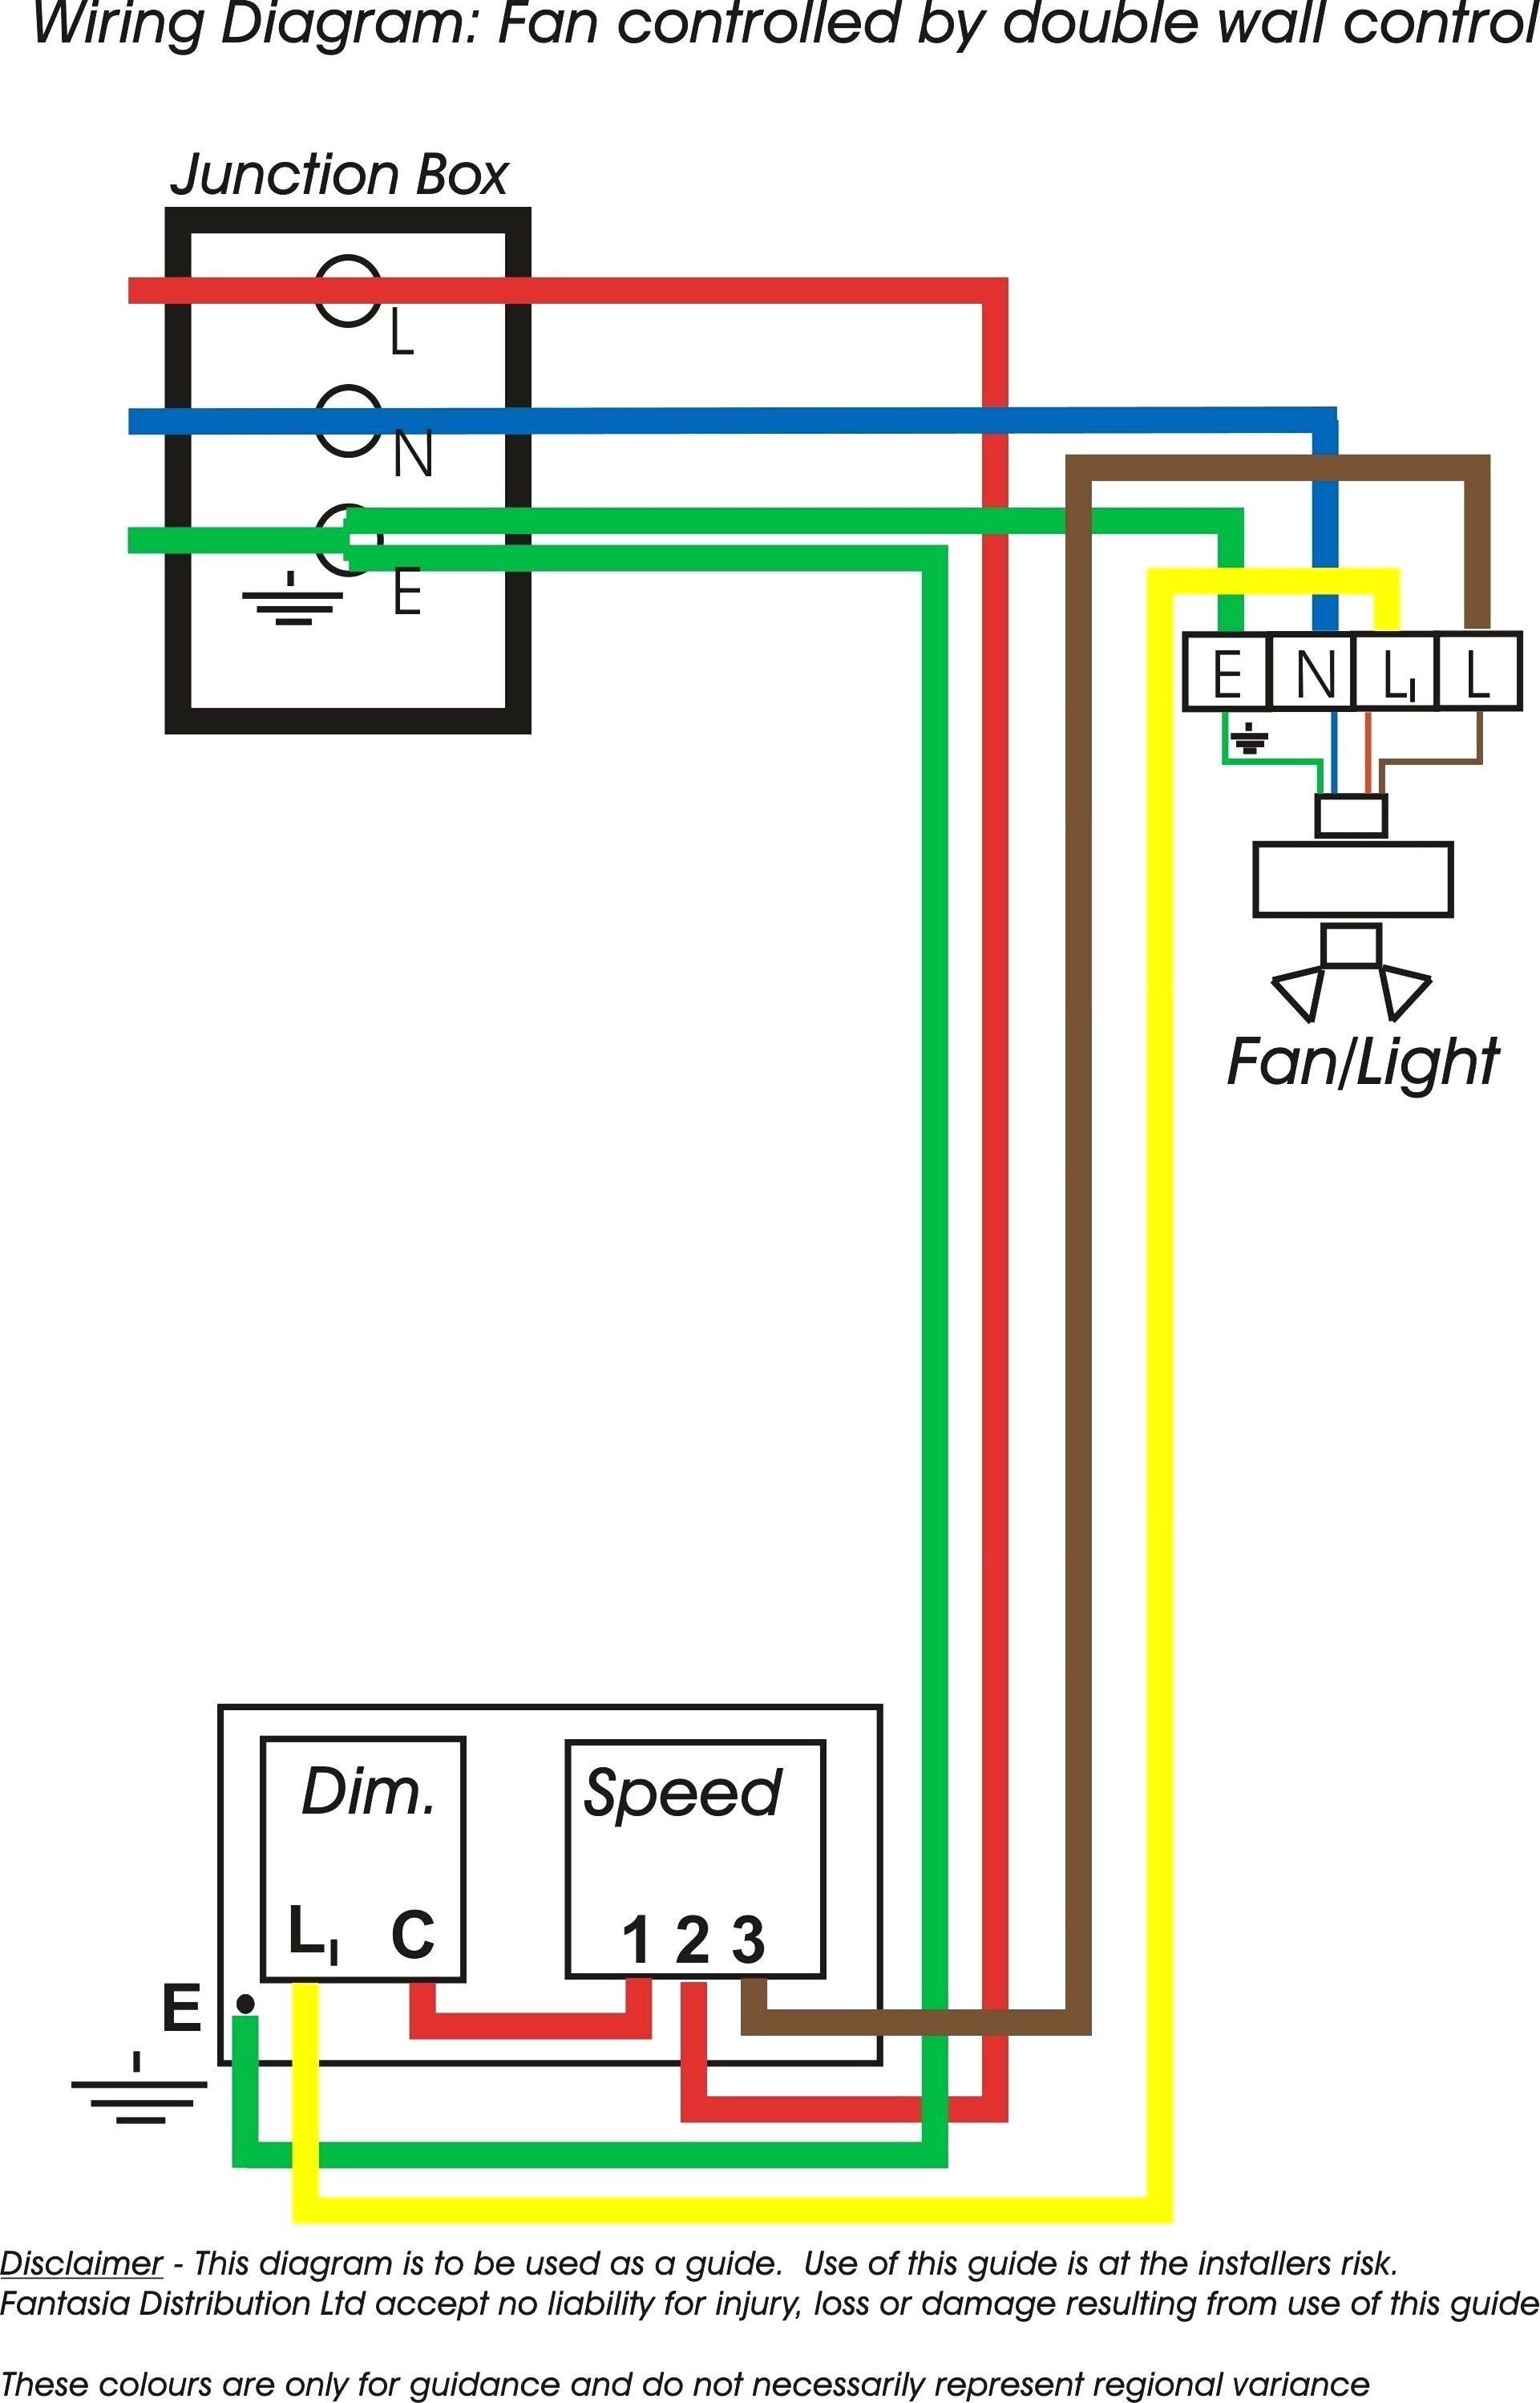 Westinghouse Ac Motor Wiring Diagram Westinghouse Wiring Diagrams Wiring Diagrams Konsult Of Westinghouse Ac Motor Wiring Diagram